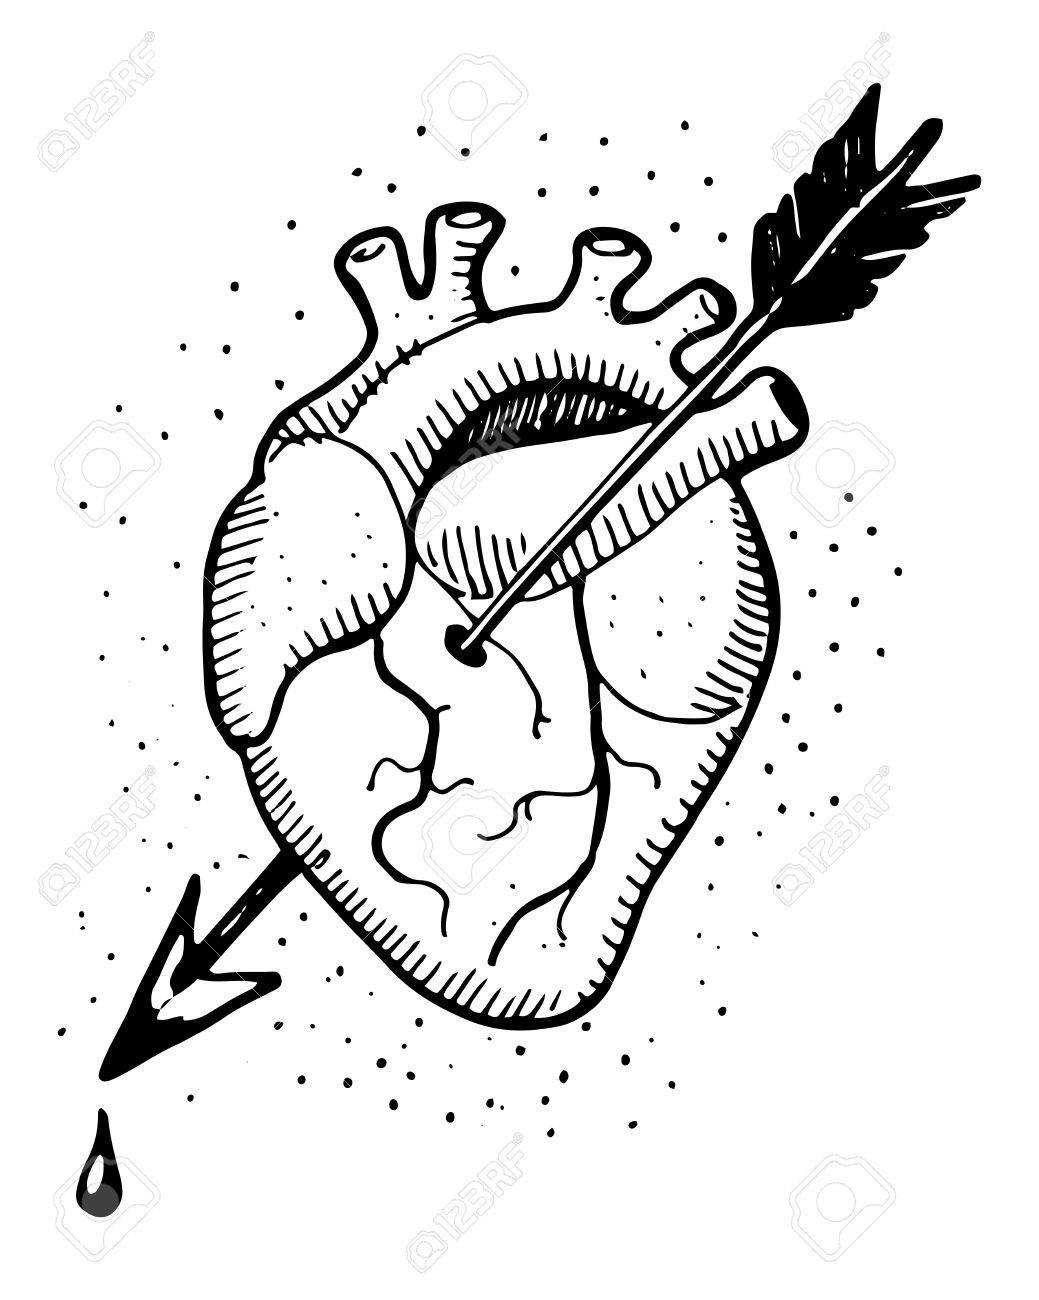 Bandaid clipart drawing. At getdrawings com free